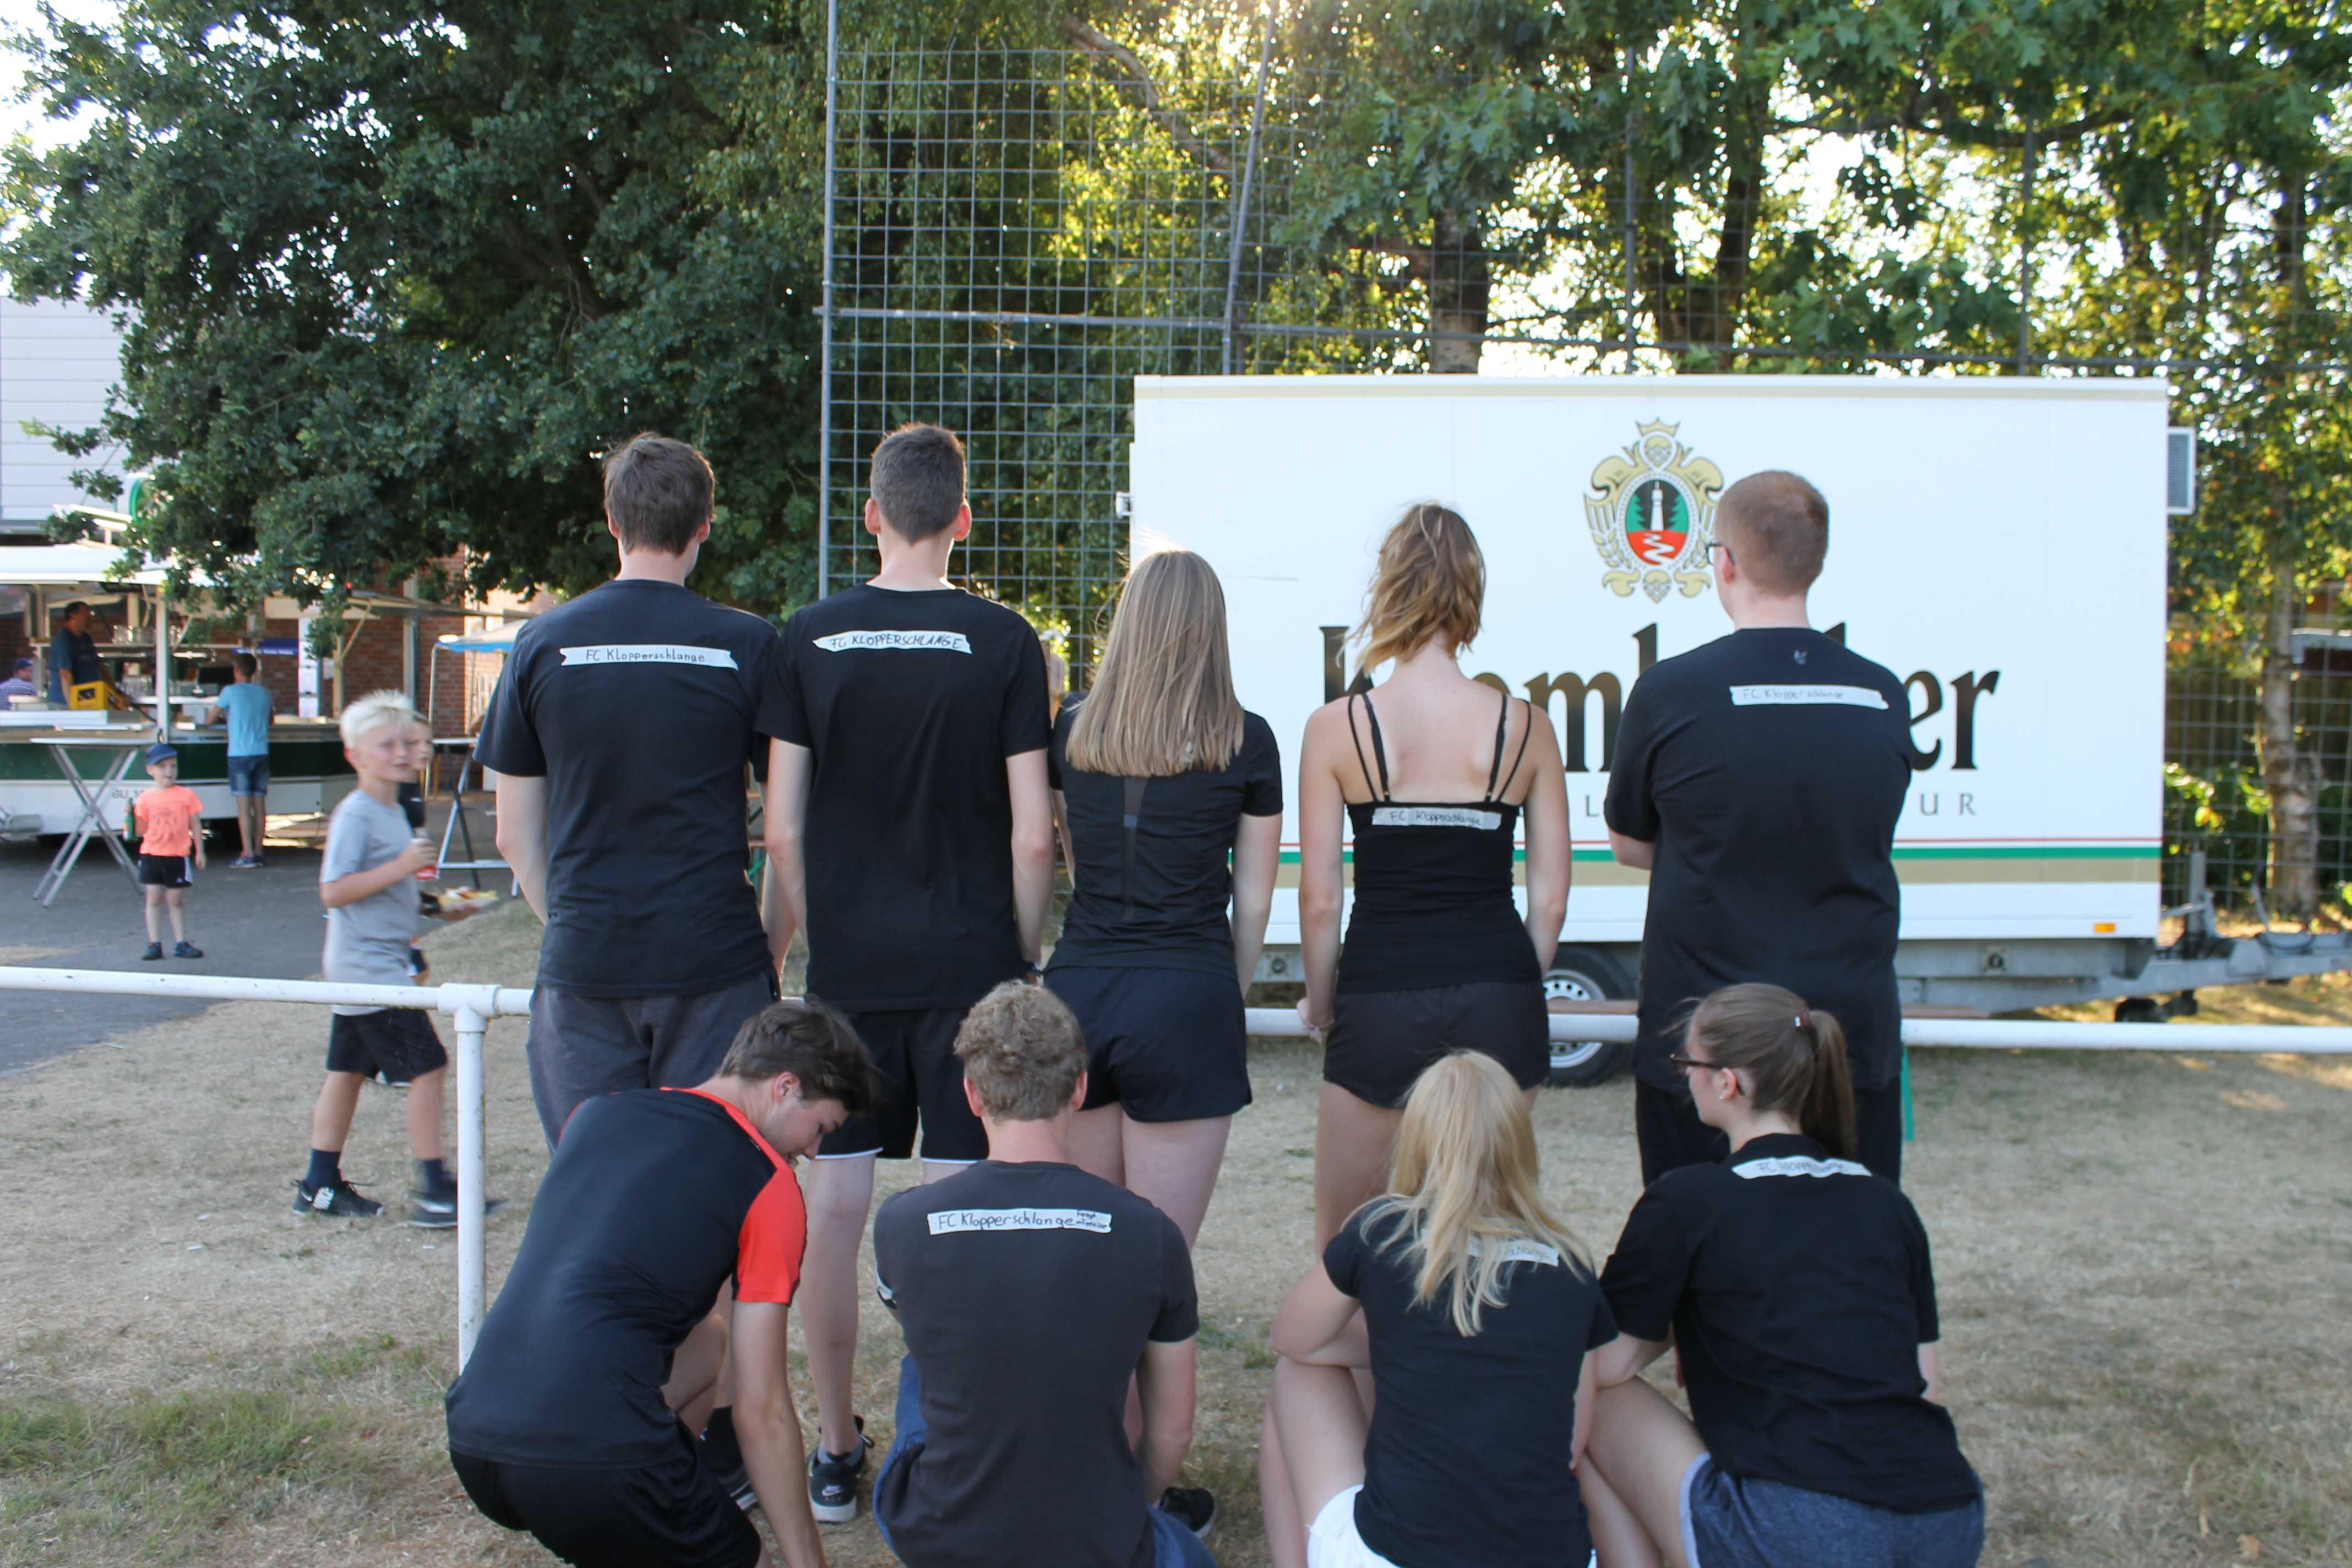 2018-07-27 Sportwoche - Flunkyball Turnier (7)